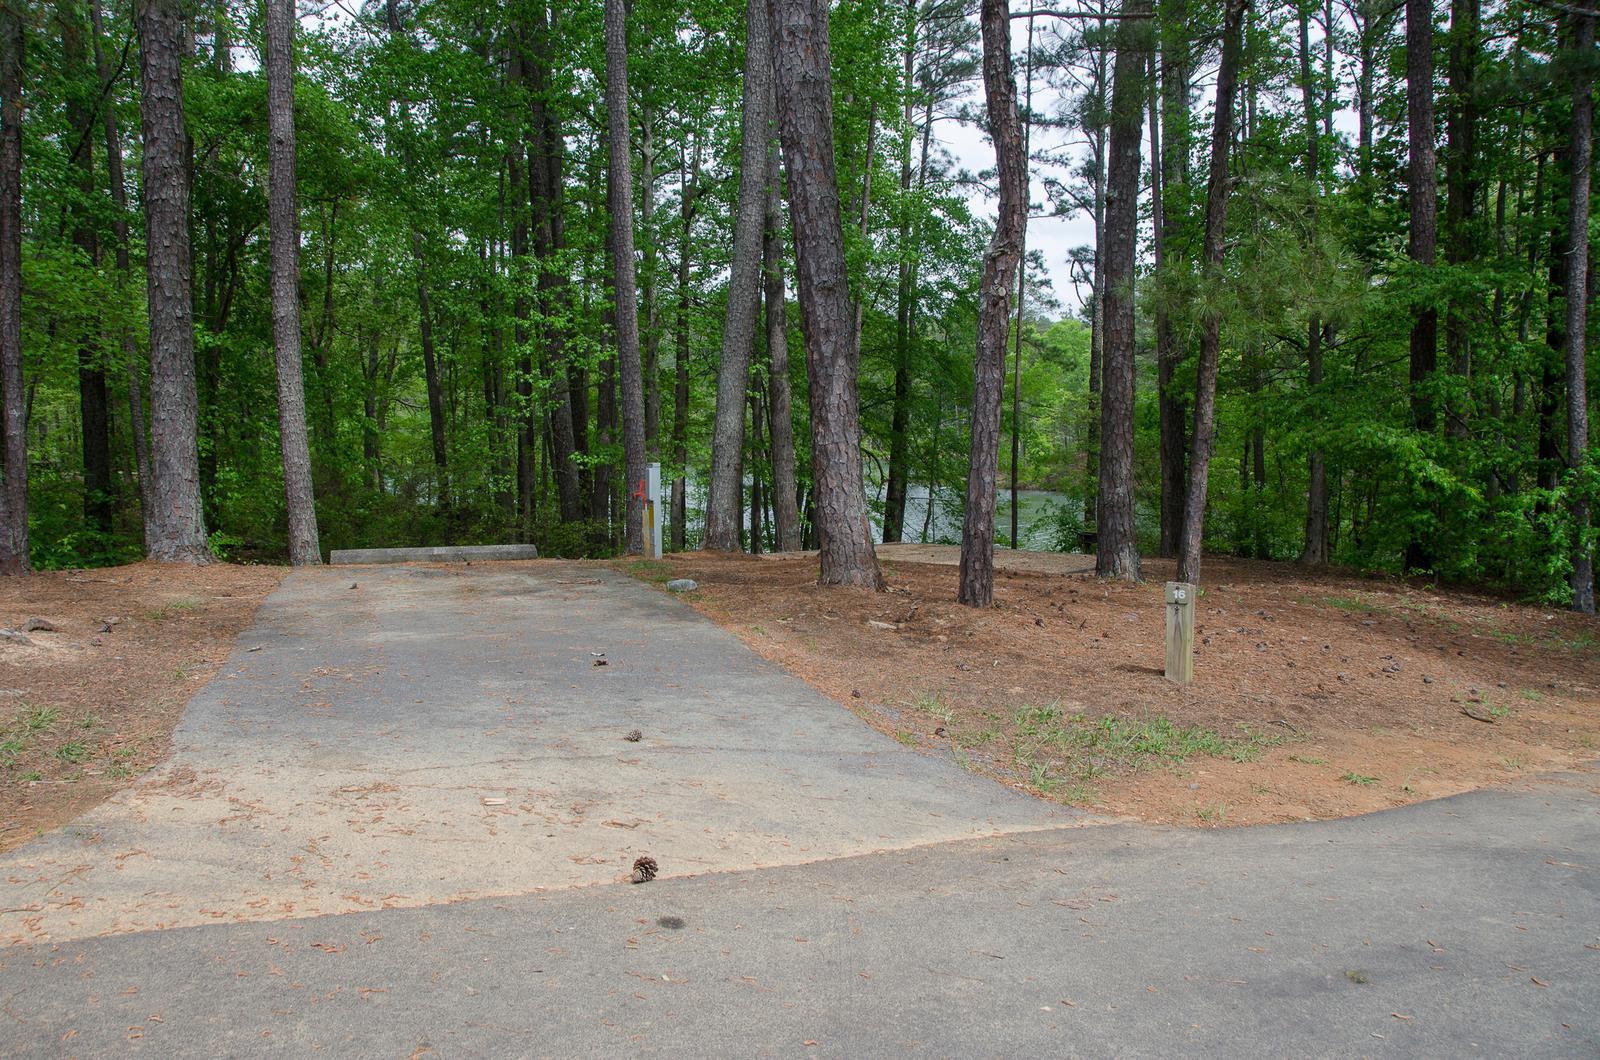 Driveway slopeMcKaskey Creek Campground, campsite #16